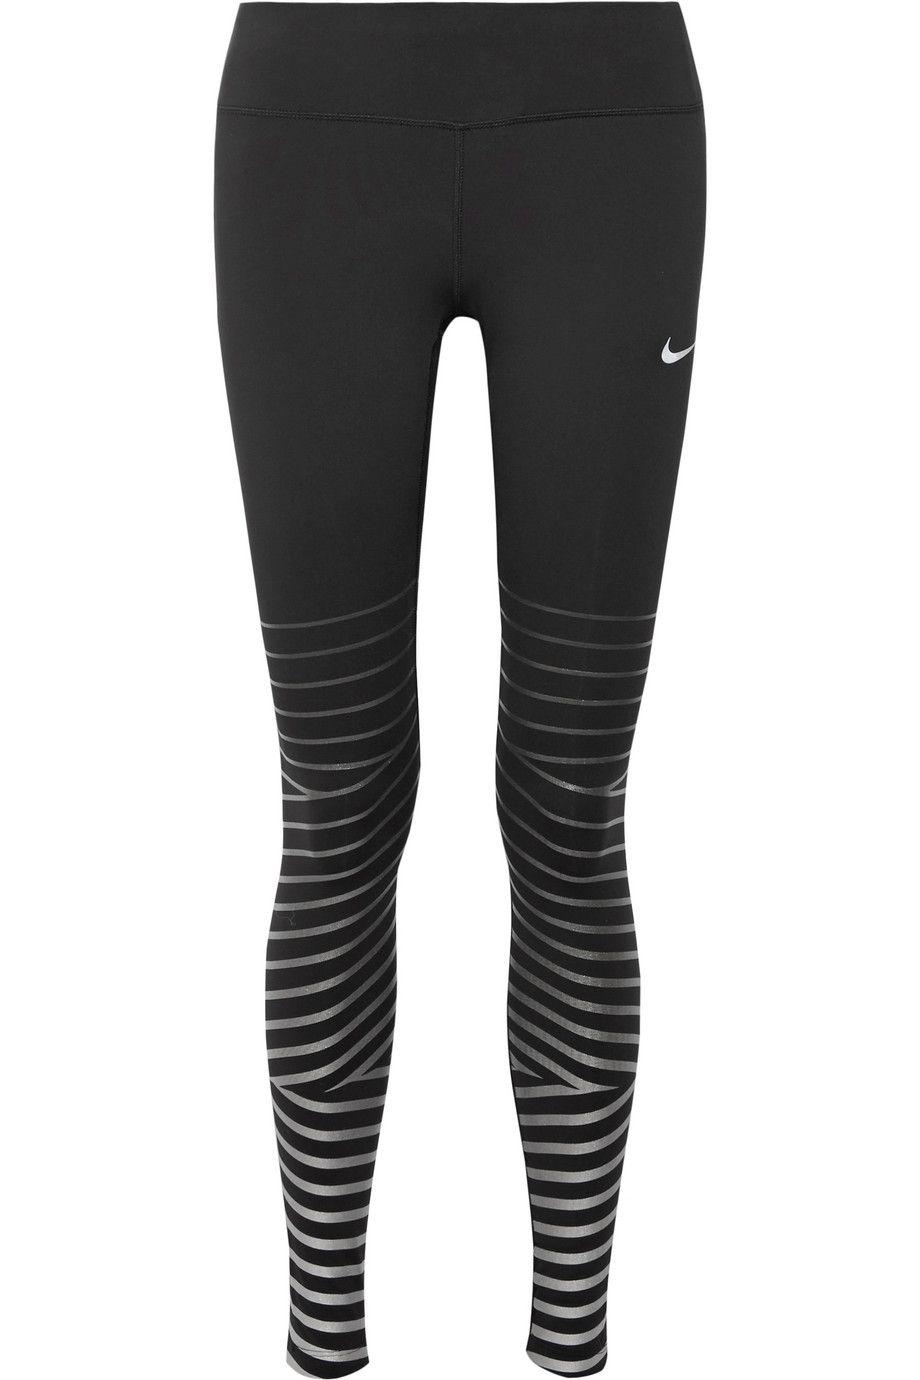 256c84dc83ad5 Nike   Power Epic Lux metallic striped Dri-FIT stretch leggings    NET-A-PORTER.COM